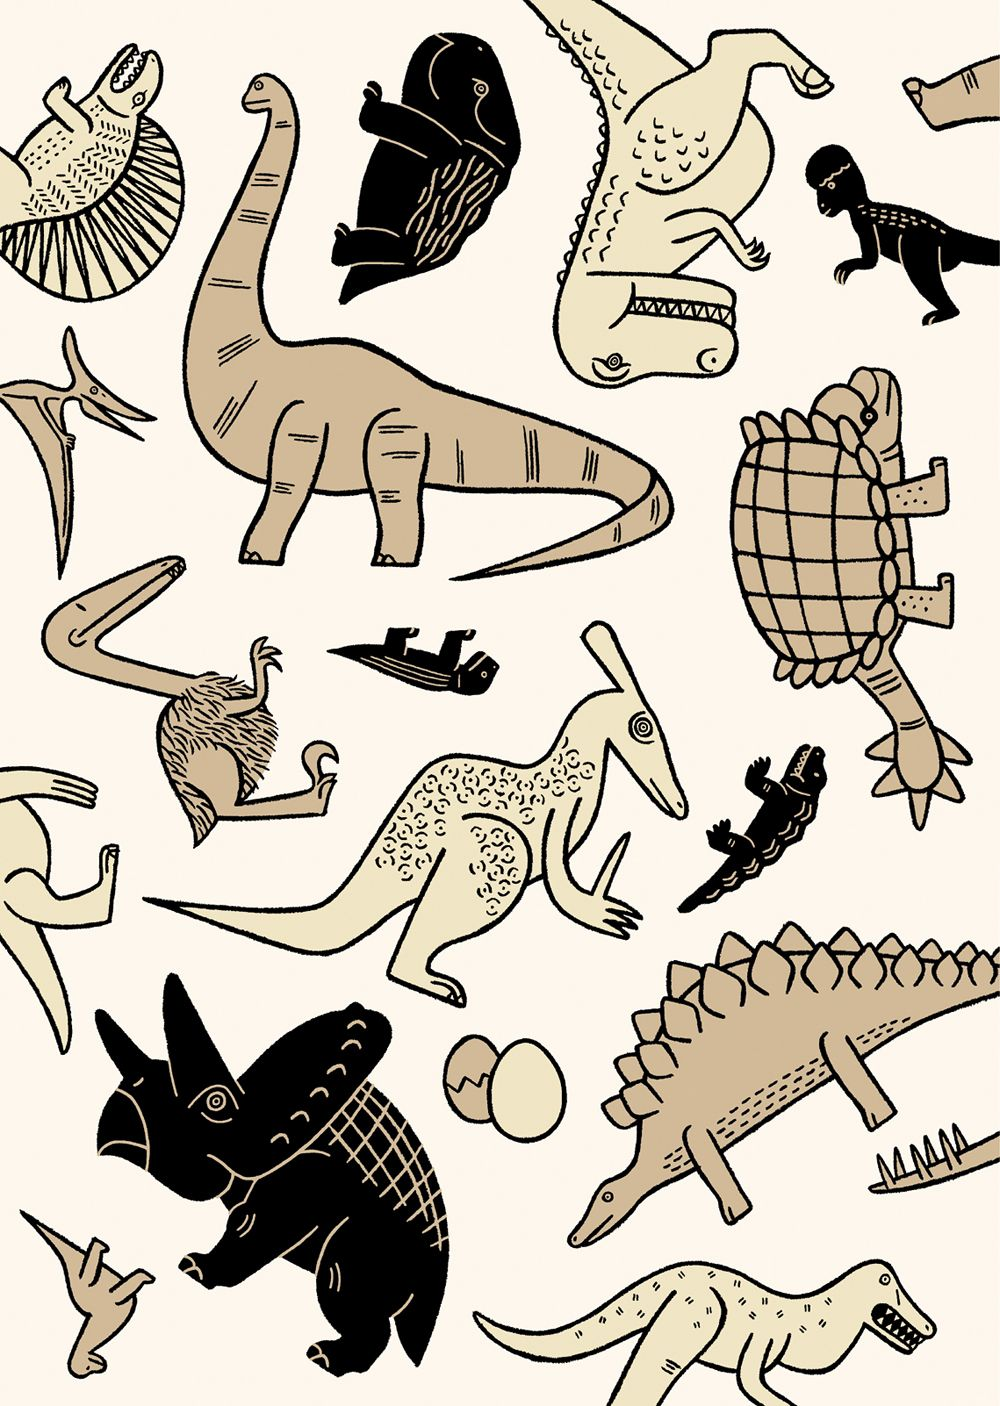 Original wrapping paper on behance in 2019 dinosaur wallpaper dinosaur images illustration art - Paperboy dinosaur wallpaper ...